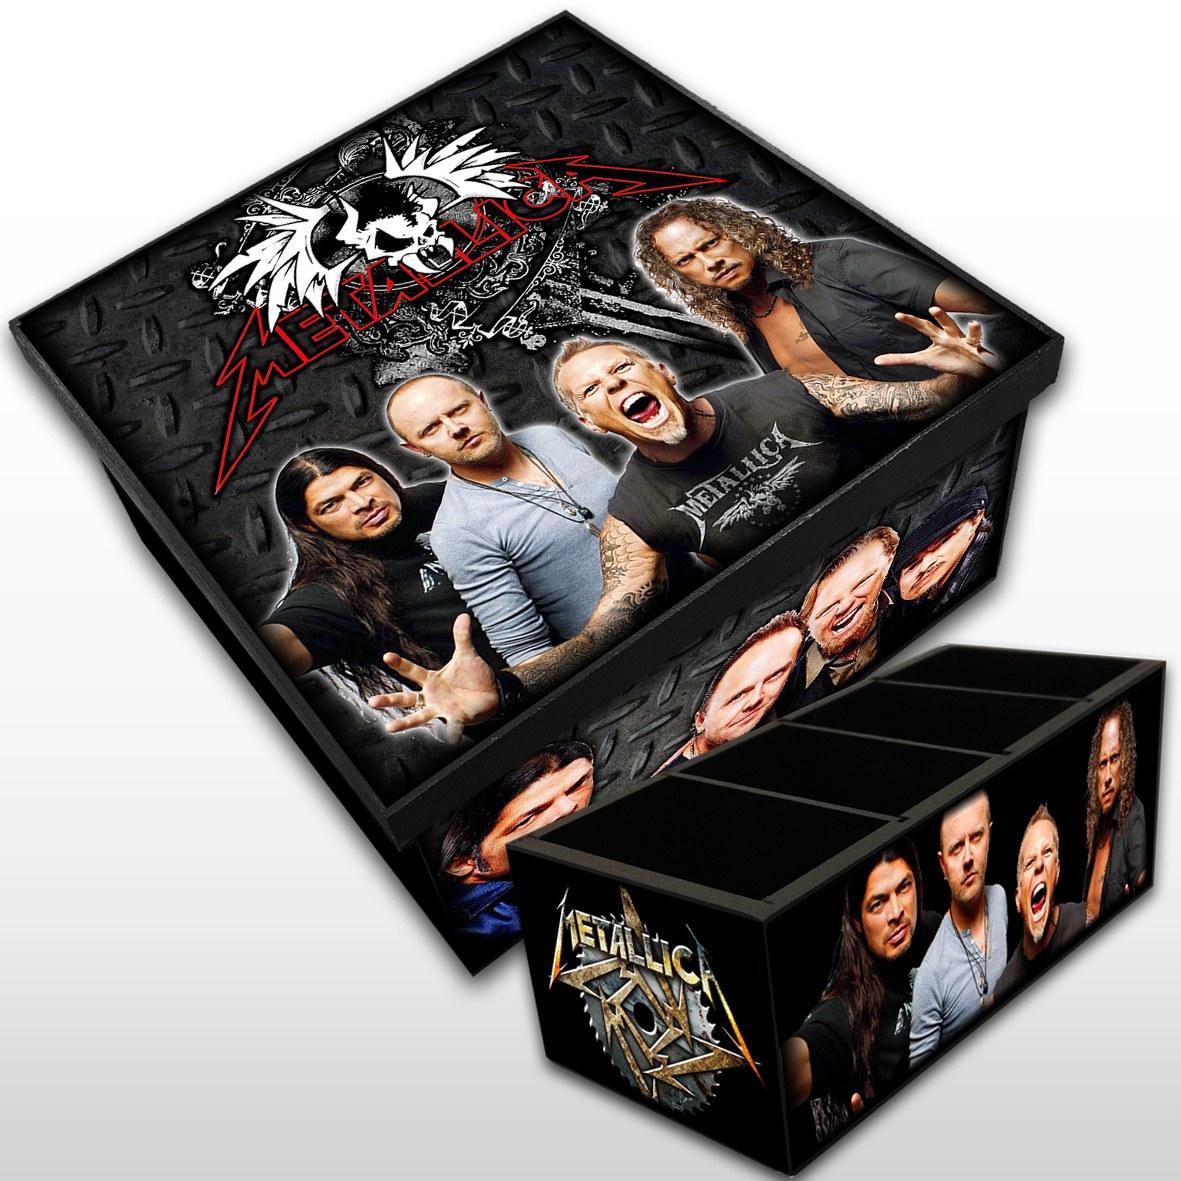 Kit Metallica - Caixa Mdf  + Porta Controle Banda